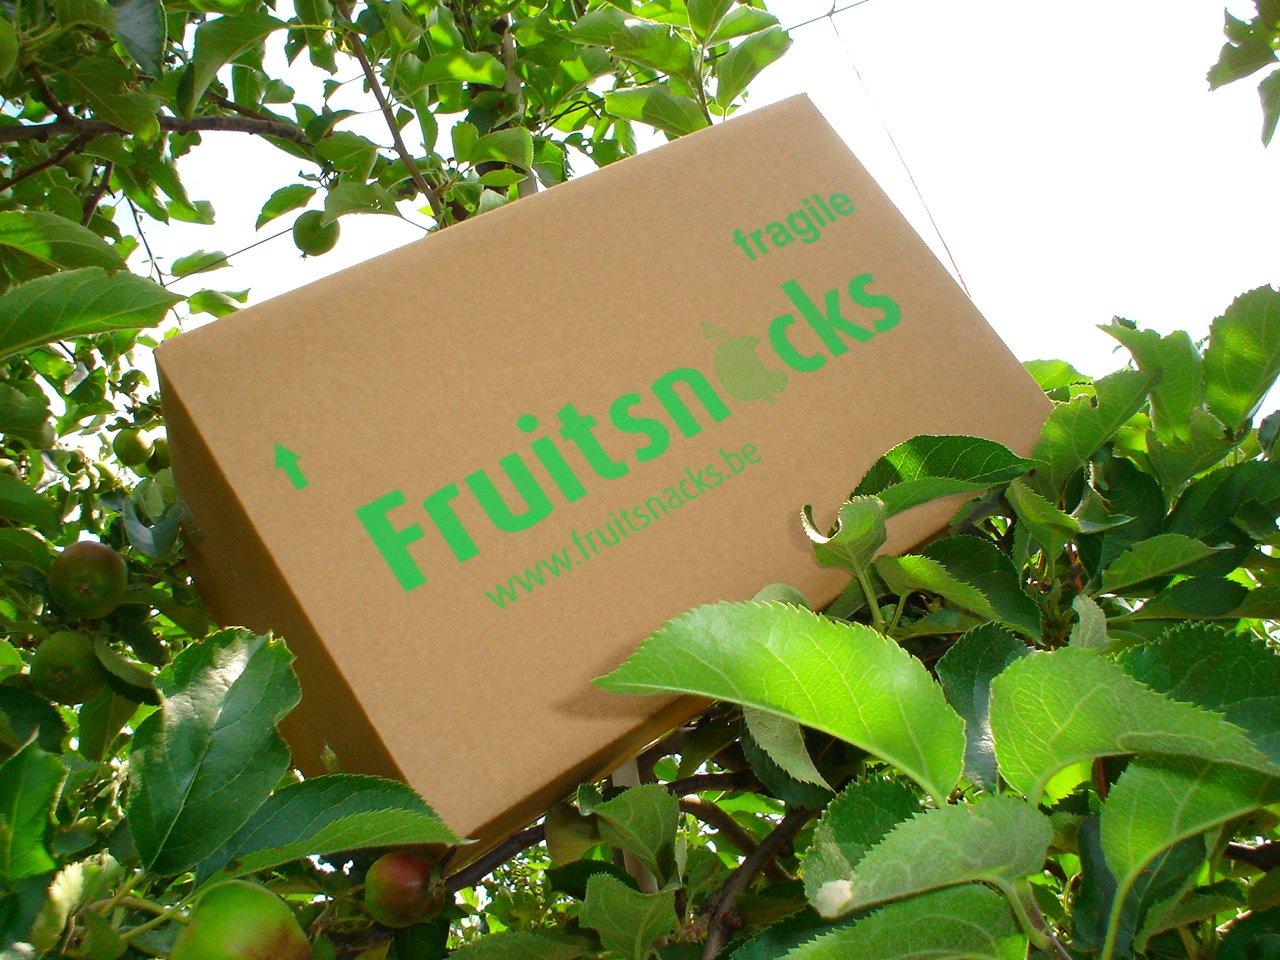 doos-fruitsnacks-in-plantage-7.JPG